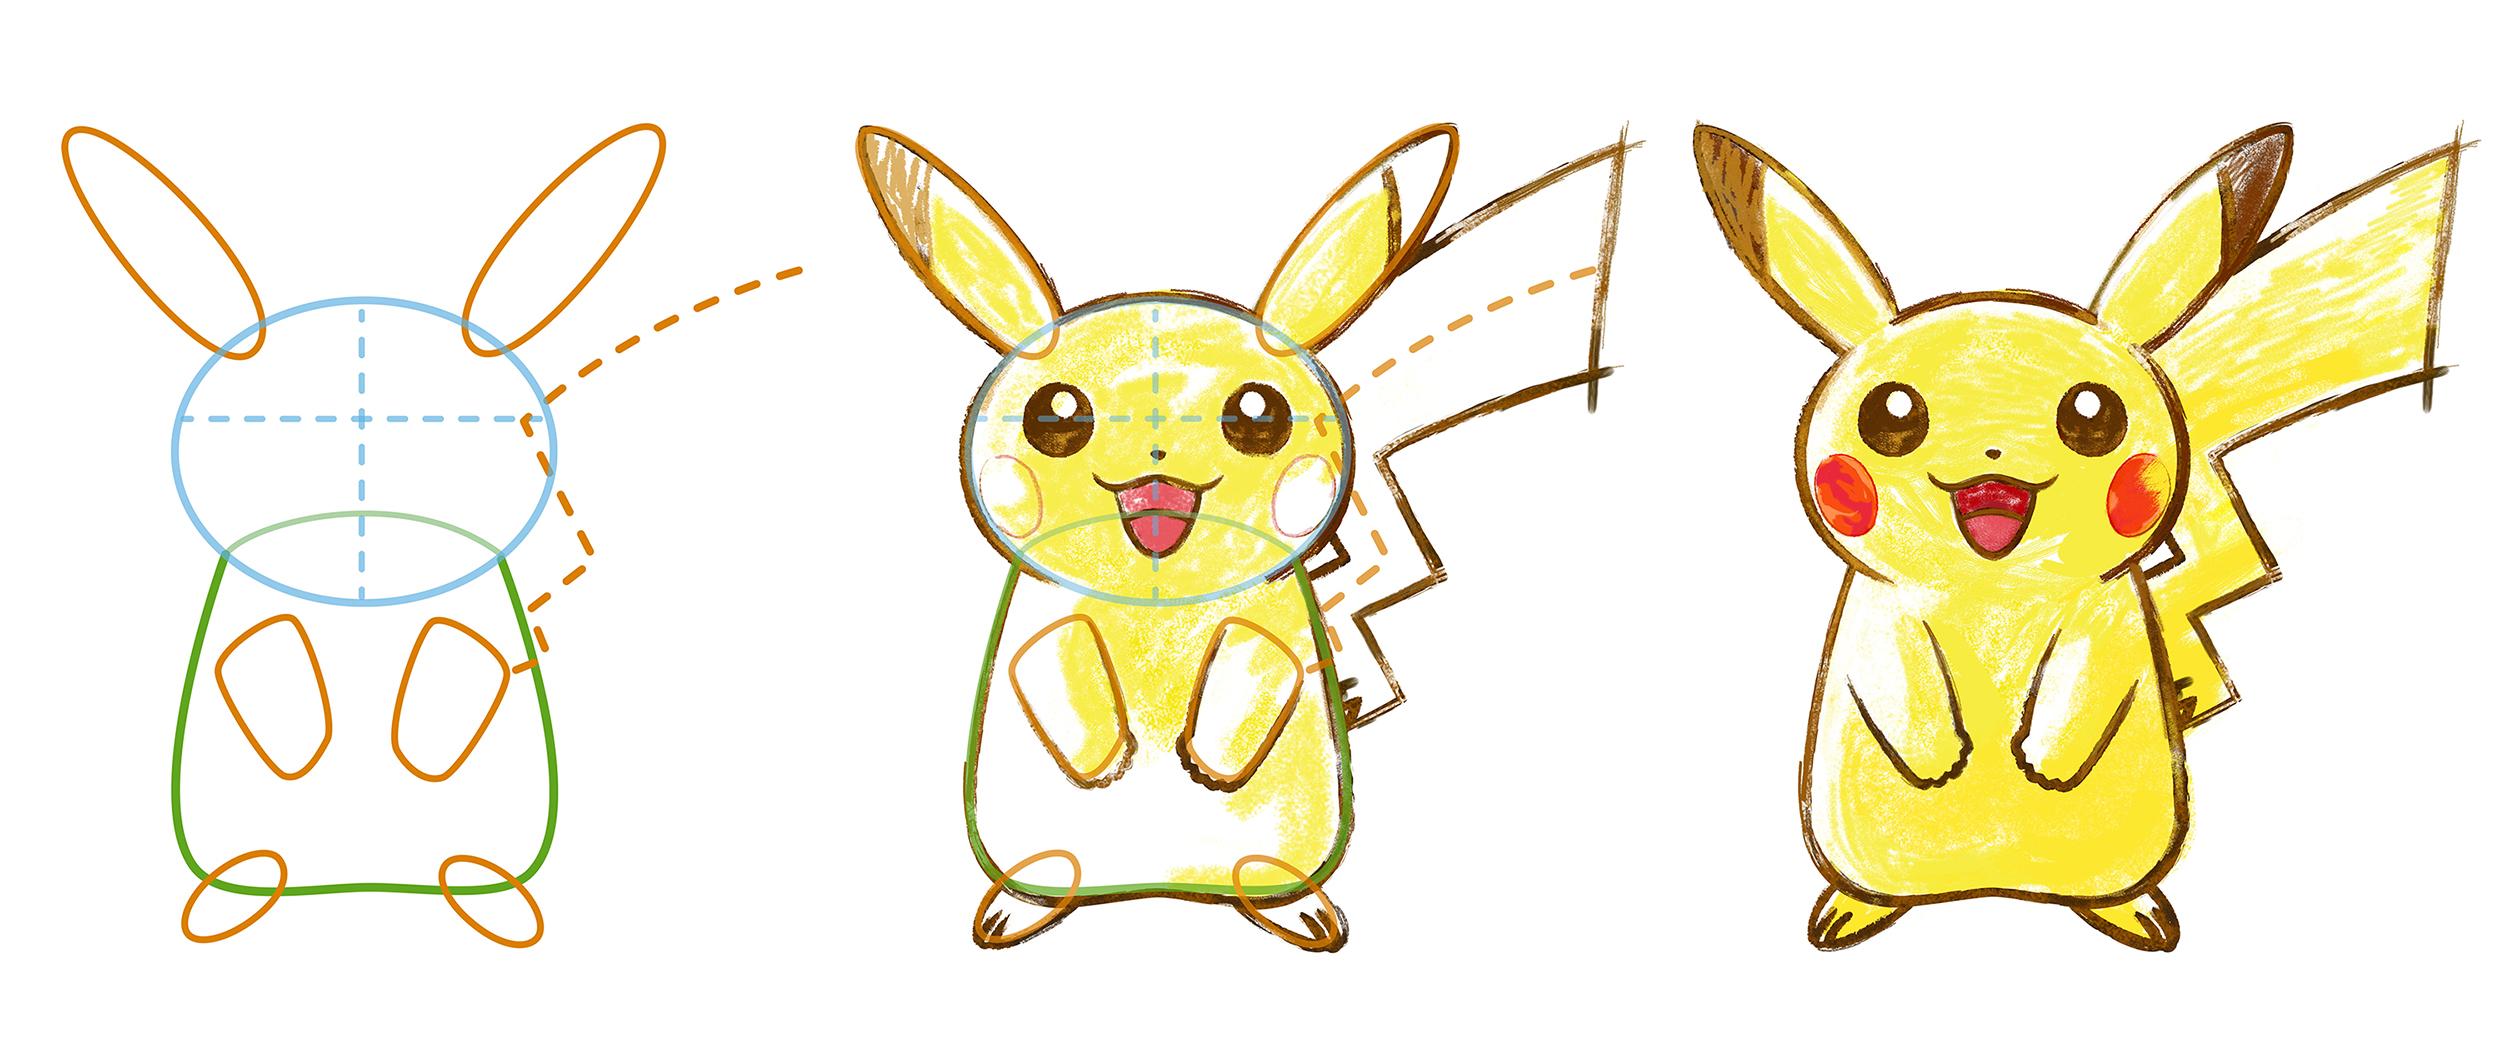 Pokemon Art Academy Images Pokémon Art Academy — Coming